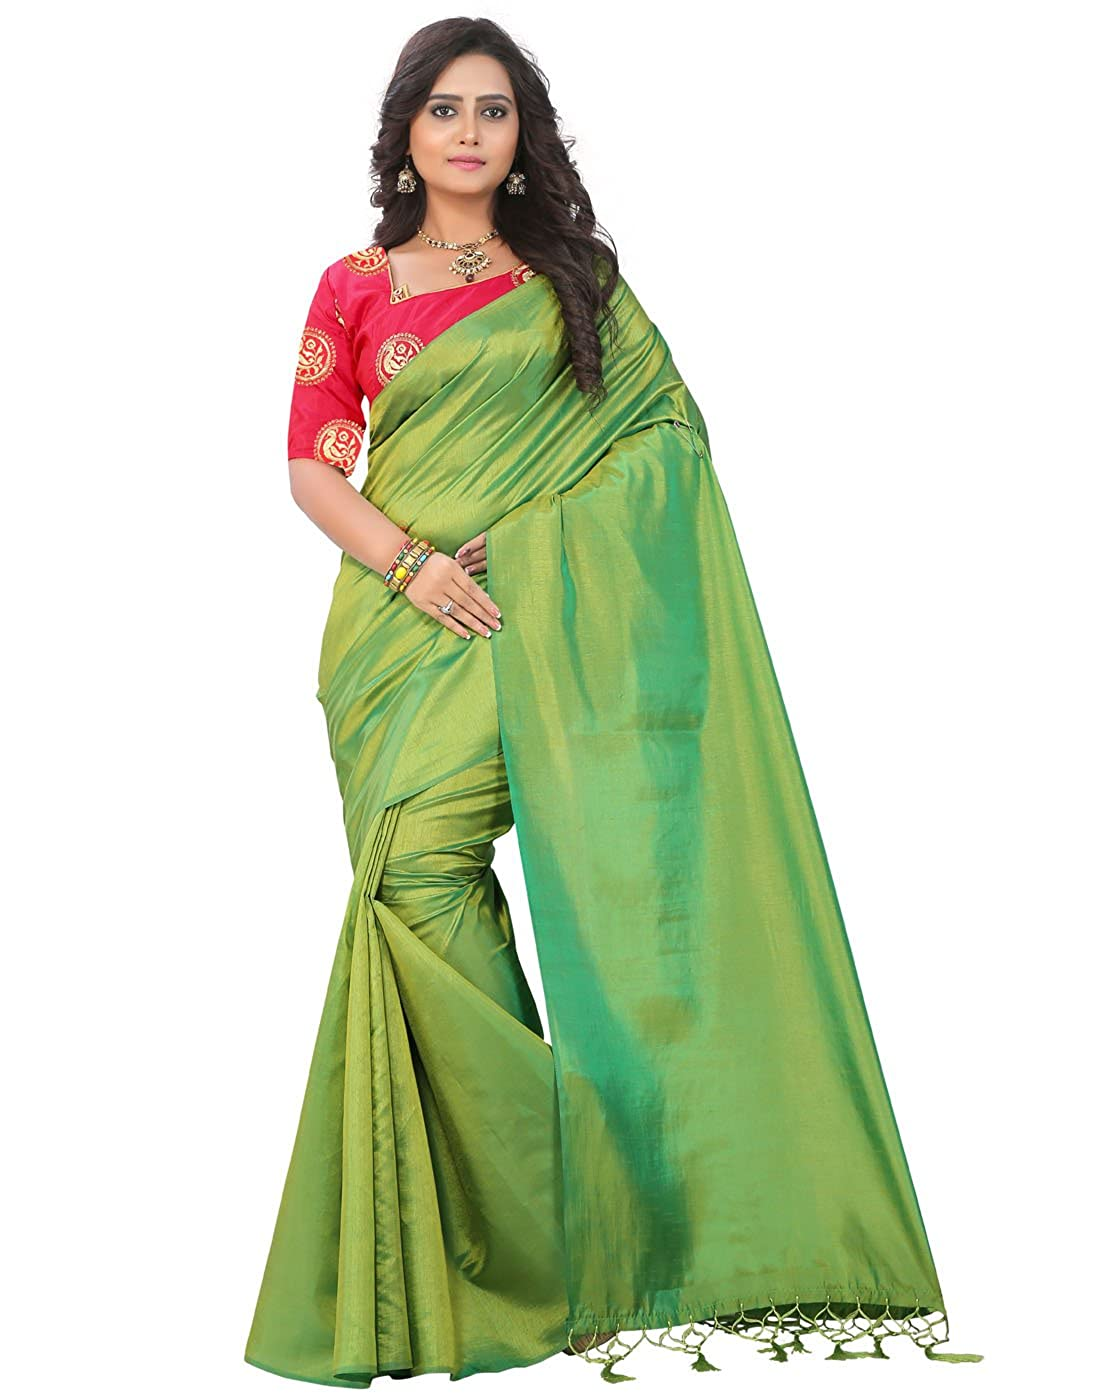 21f23b4342708 e-VASTRAM Artificial Silk Tassel Saree (Sanag Green Free Size)  Amazon.in   Clothing   Accessories